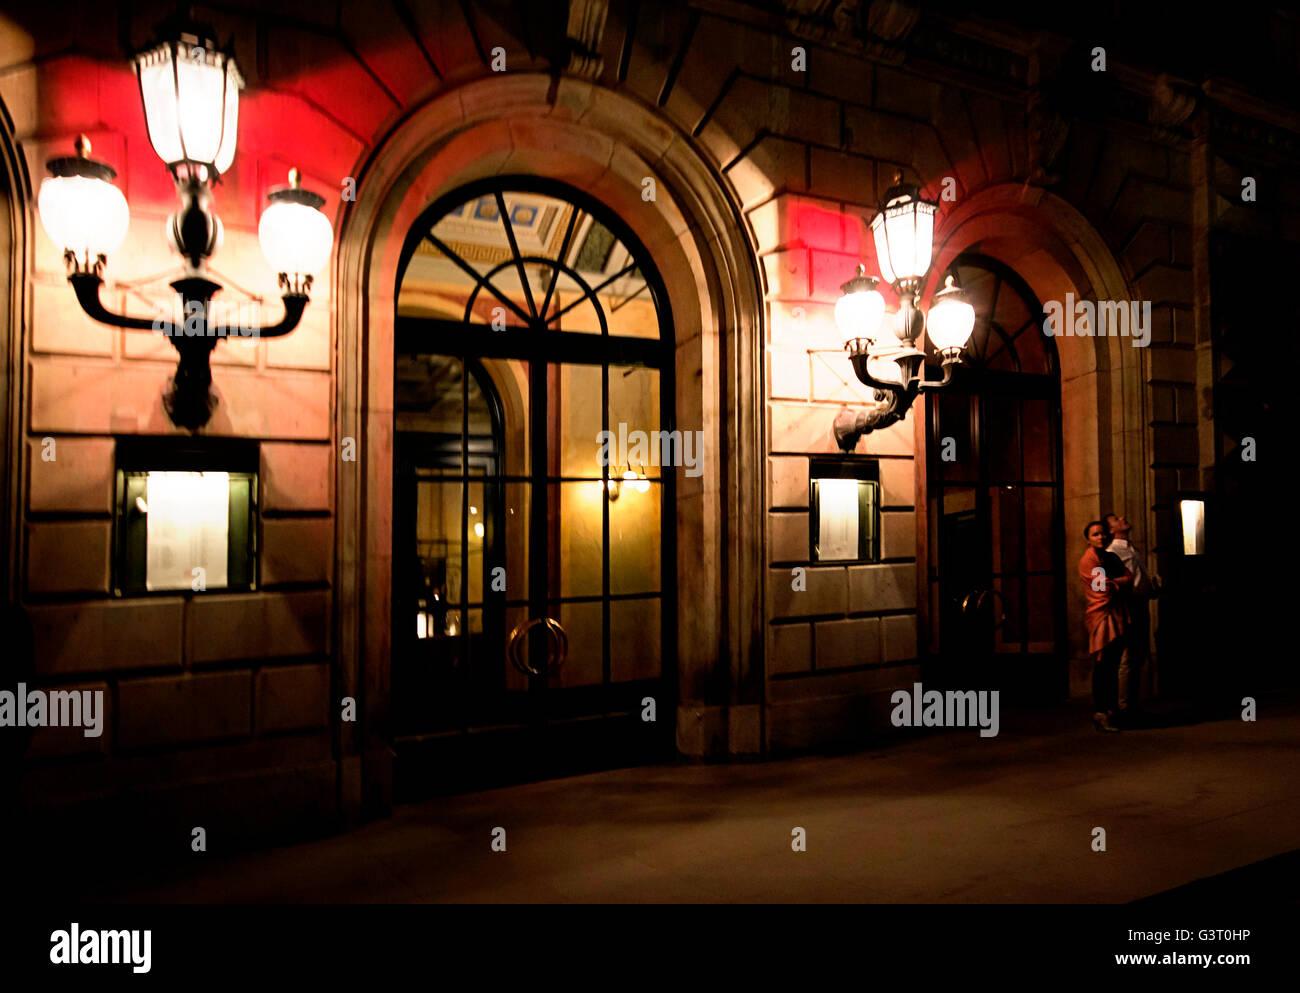 Copenhagen, Denmark, entrance of the Royal Danish Theatre in Kongens Nytorv at night. - Stock Image